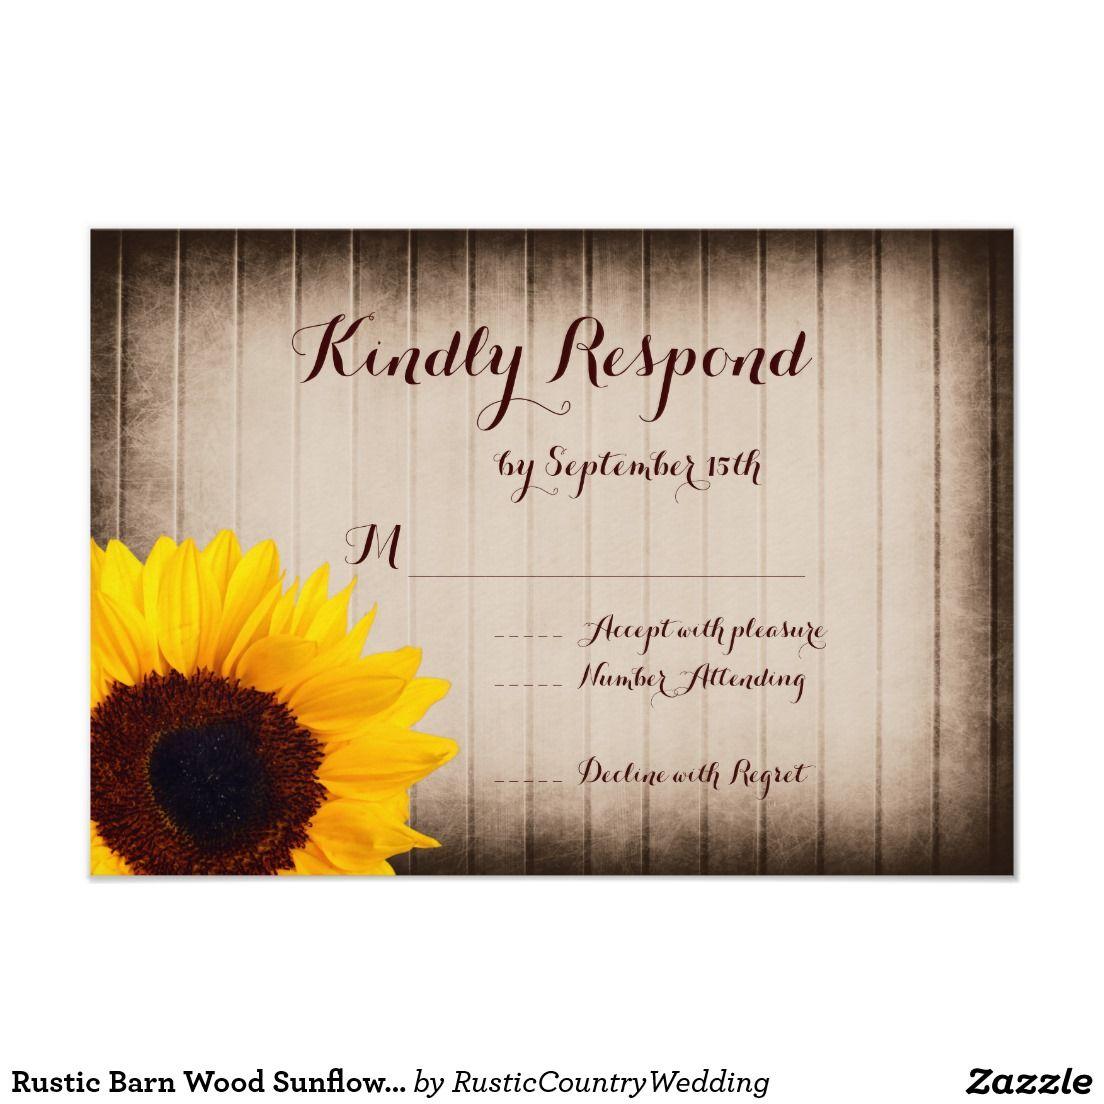 Rustic Barn Wood Sunflower Wedding RSVP Cards